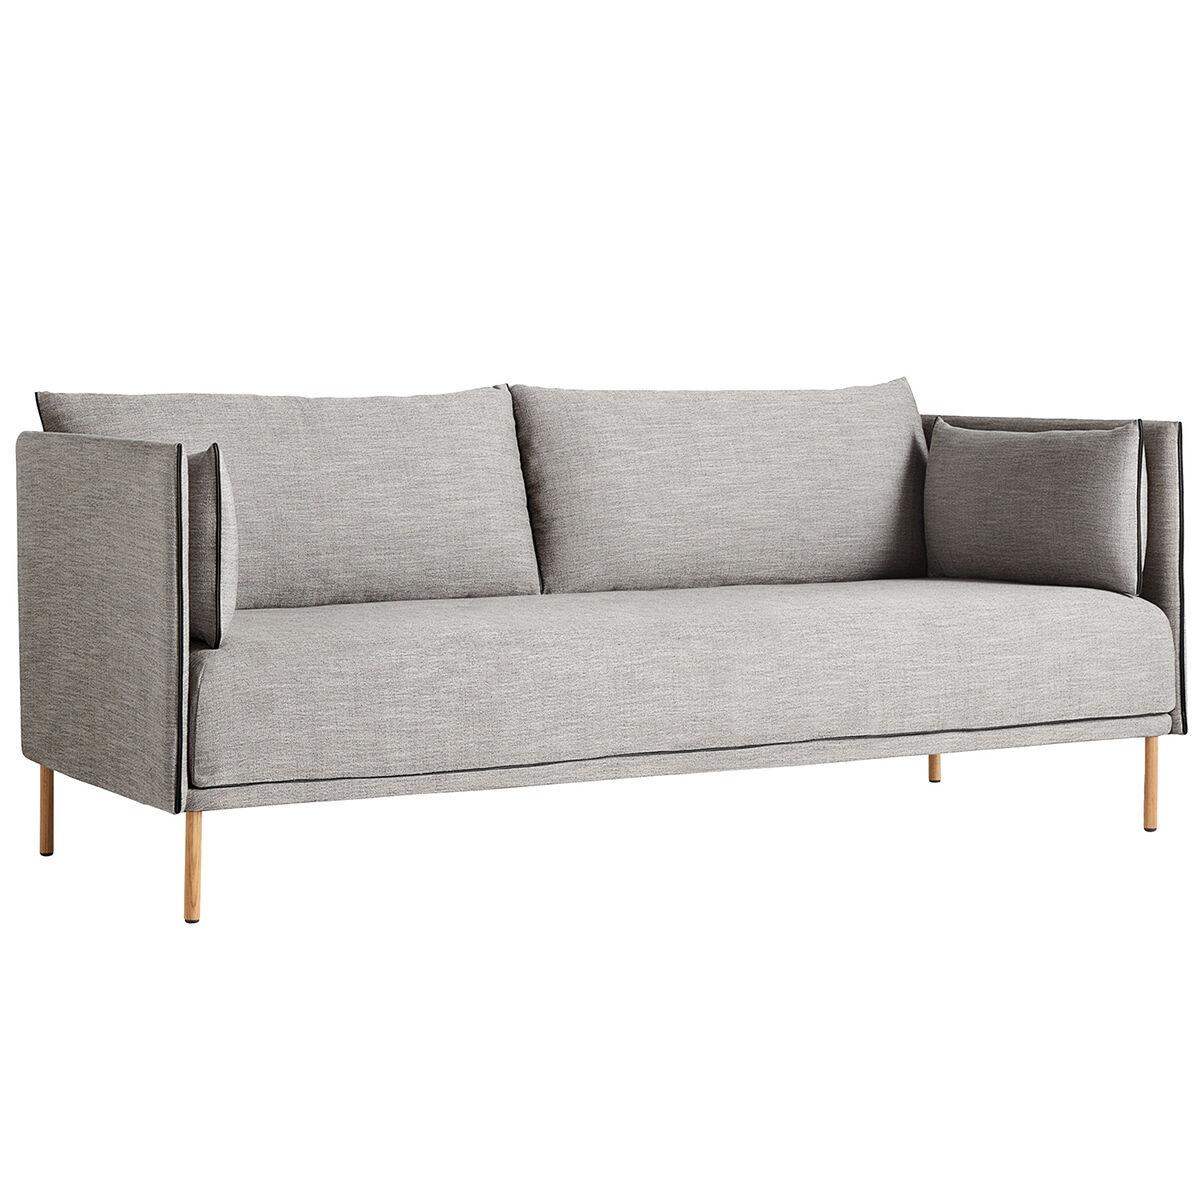 Hay Silhouette sohva 2-ist, Ruskin 33/Silk black - �ljytty tammi